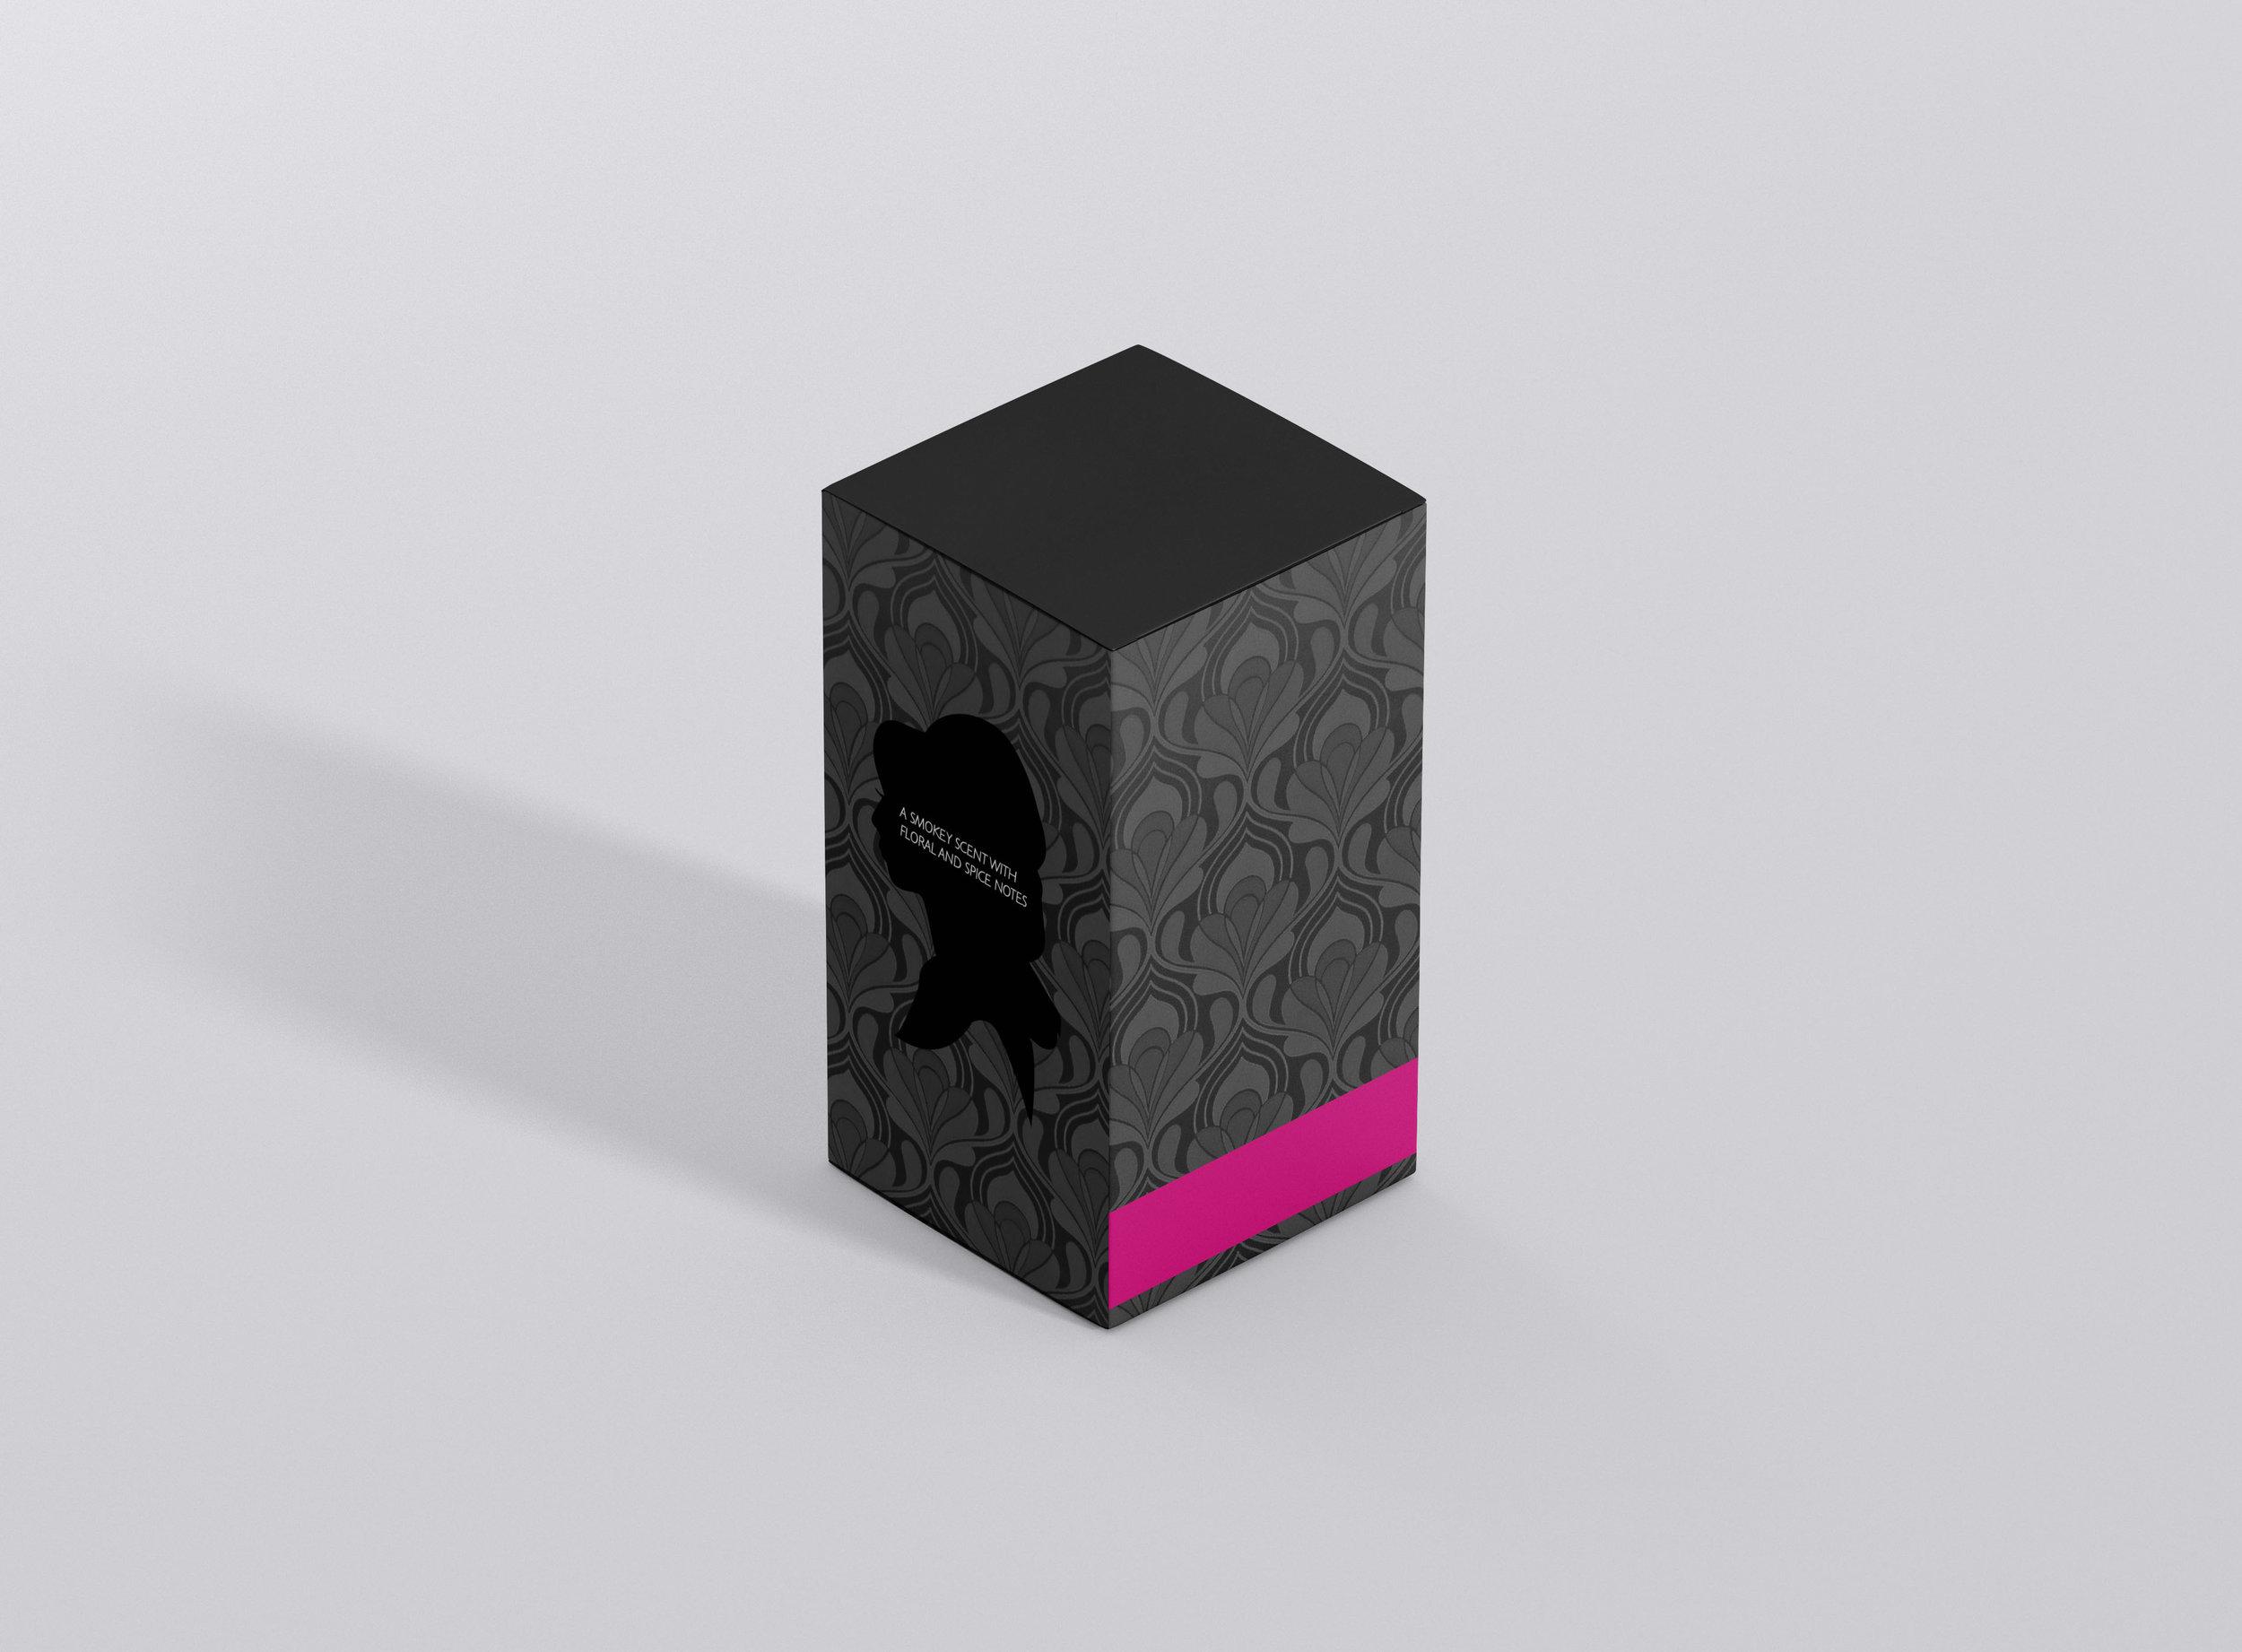 rectangle_box_side.jpg